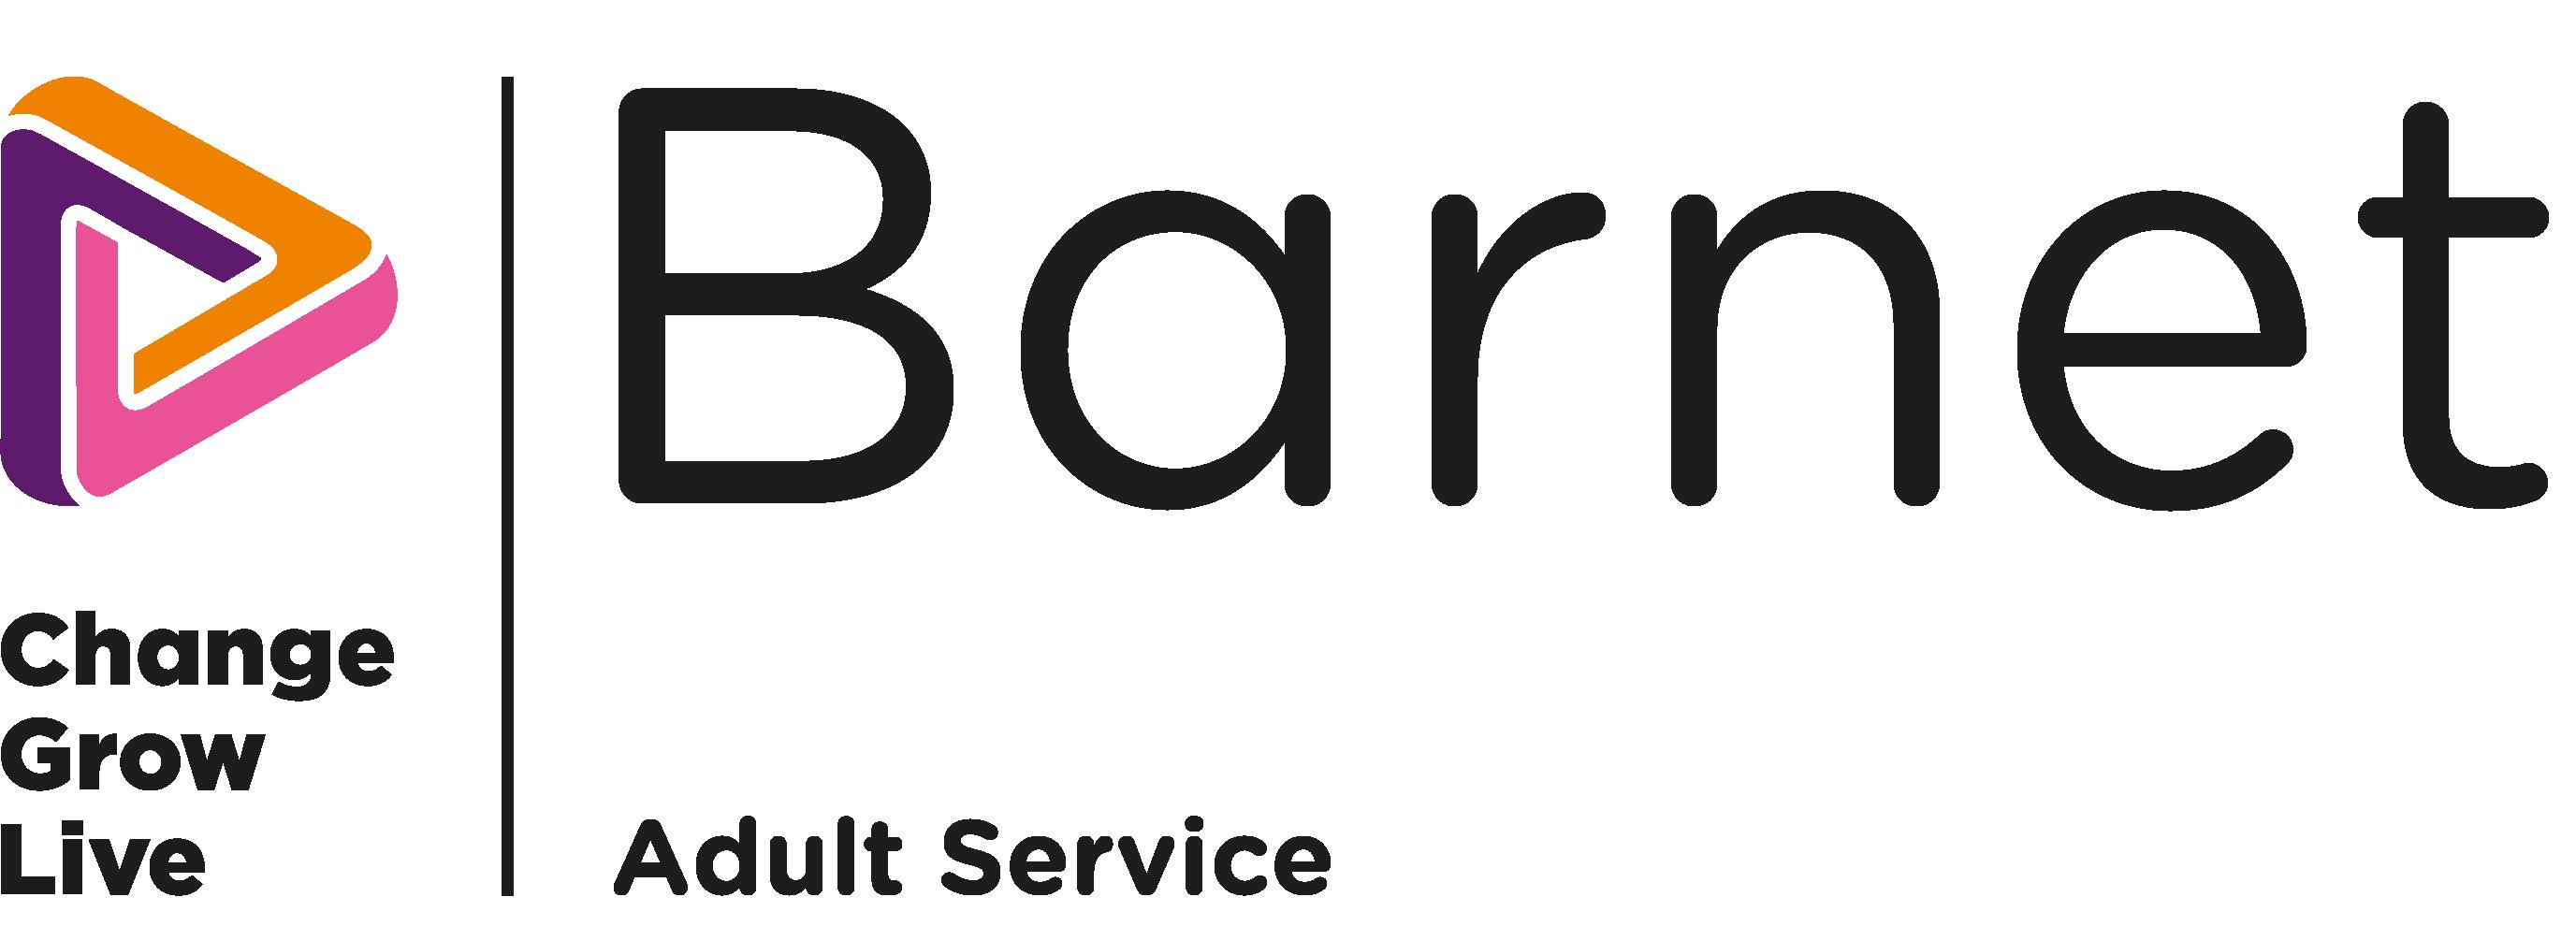 The Barnet logo in colour